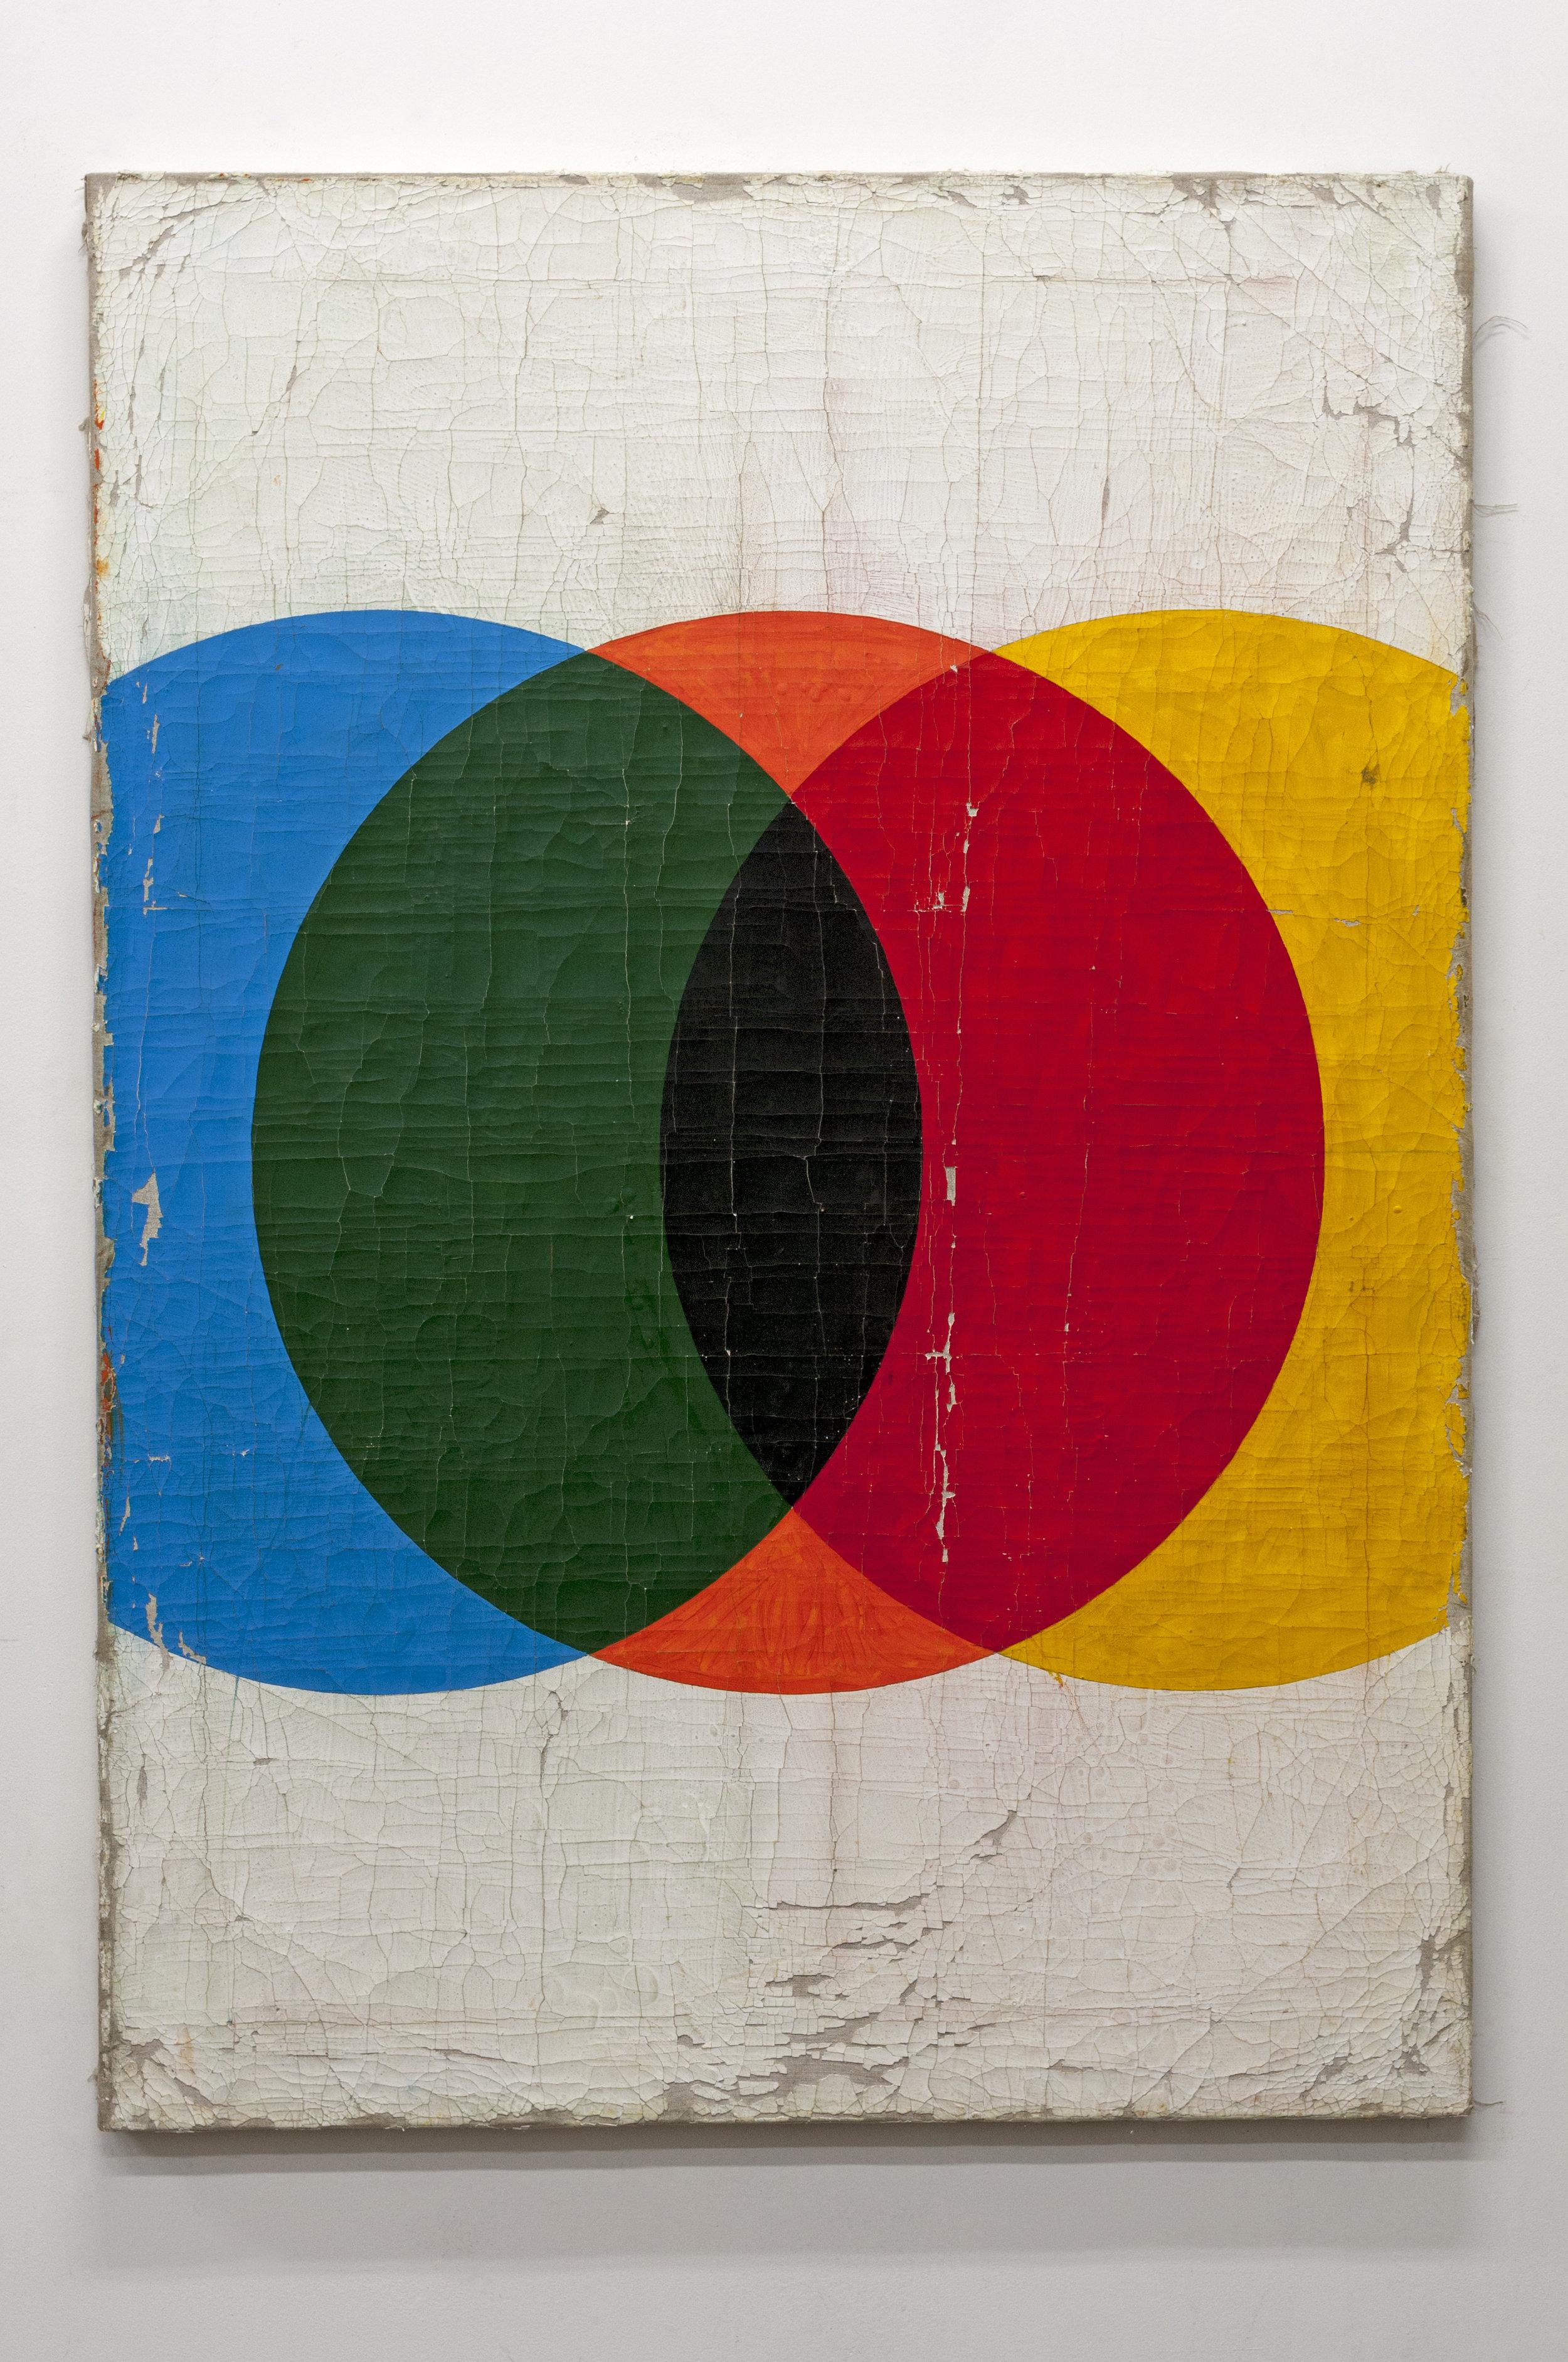 Dan Levenson  Hanni Winkelmann , 2018 oil on linen 119 x 84 cm 46 27/32 x 33 1/16 inches